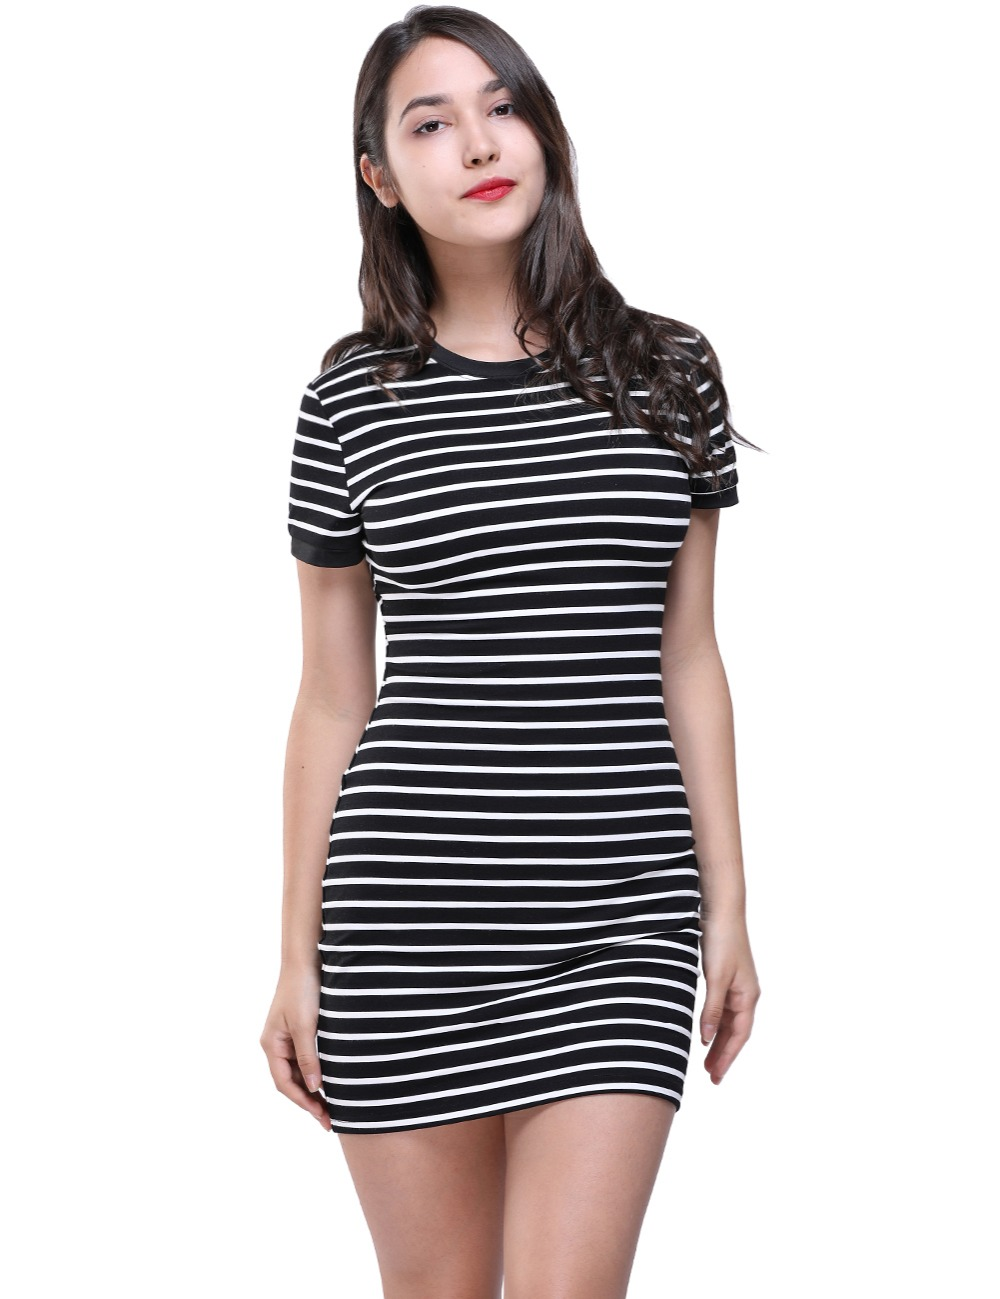 Vestido curto listrado preto e branco